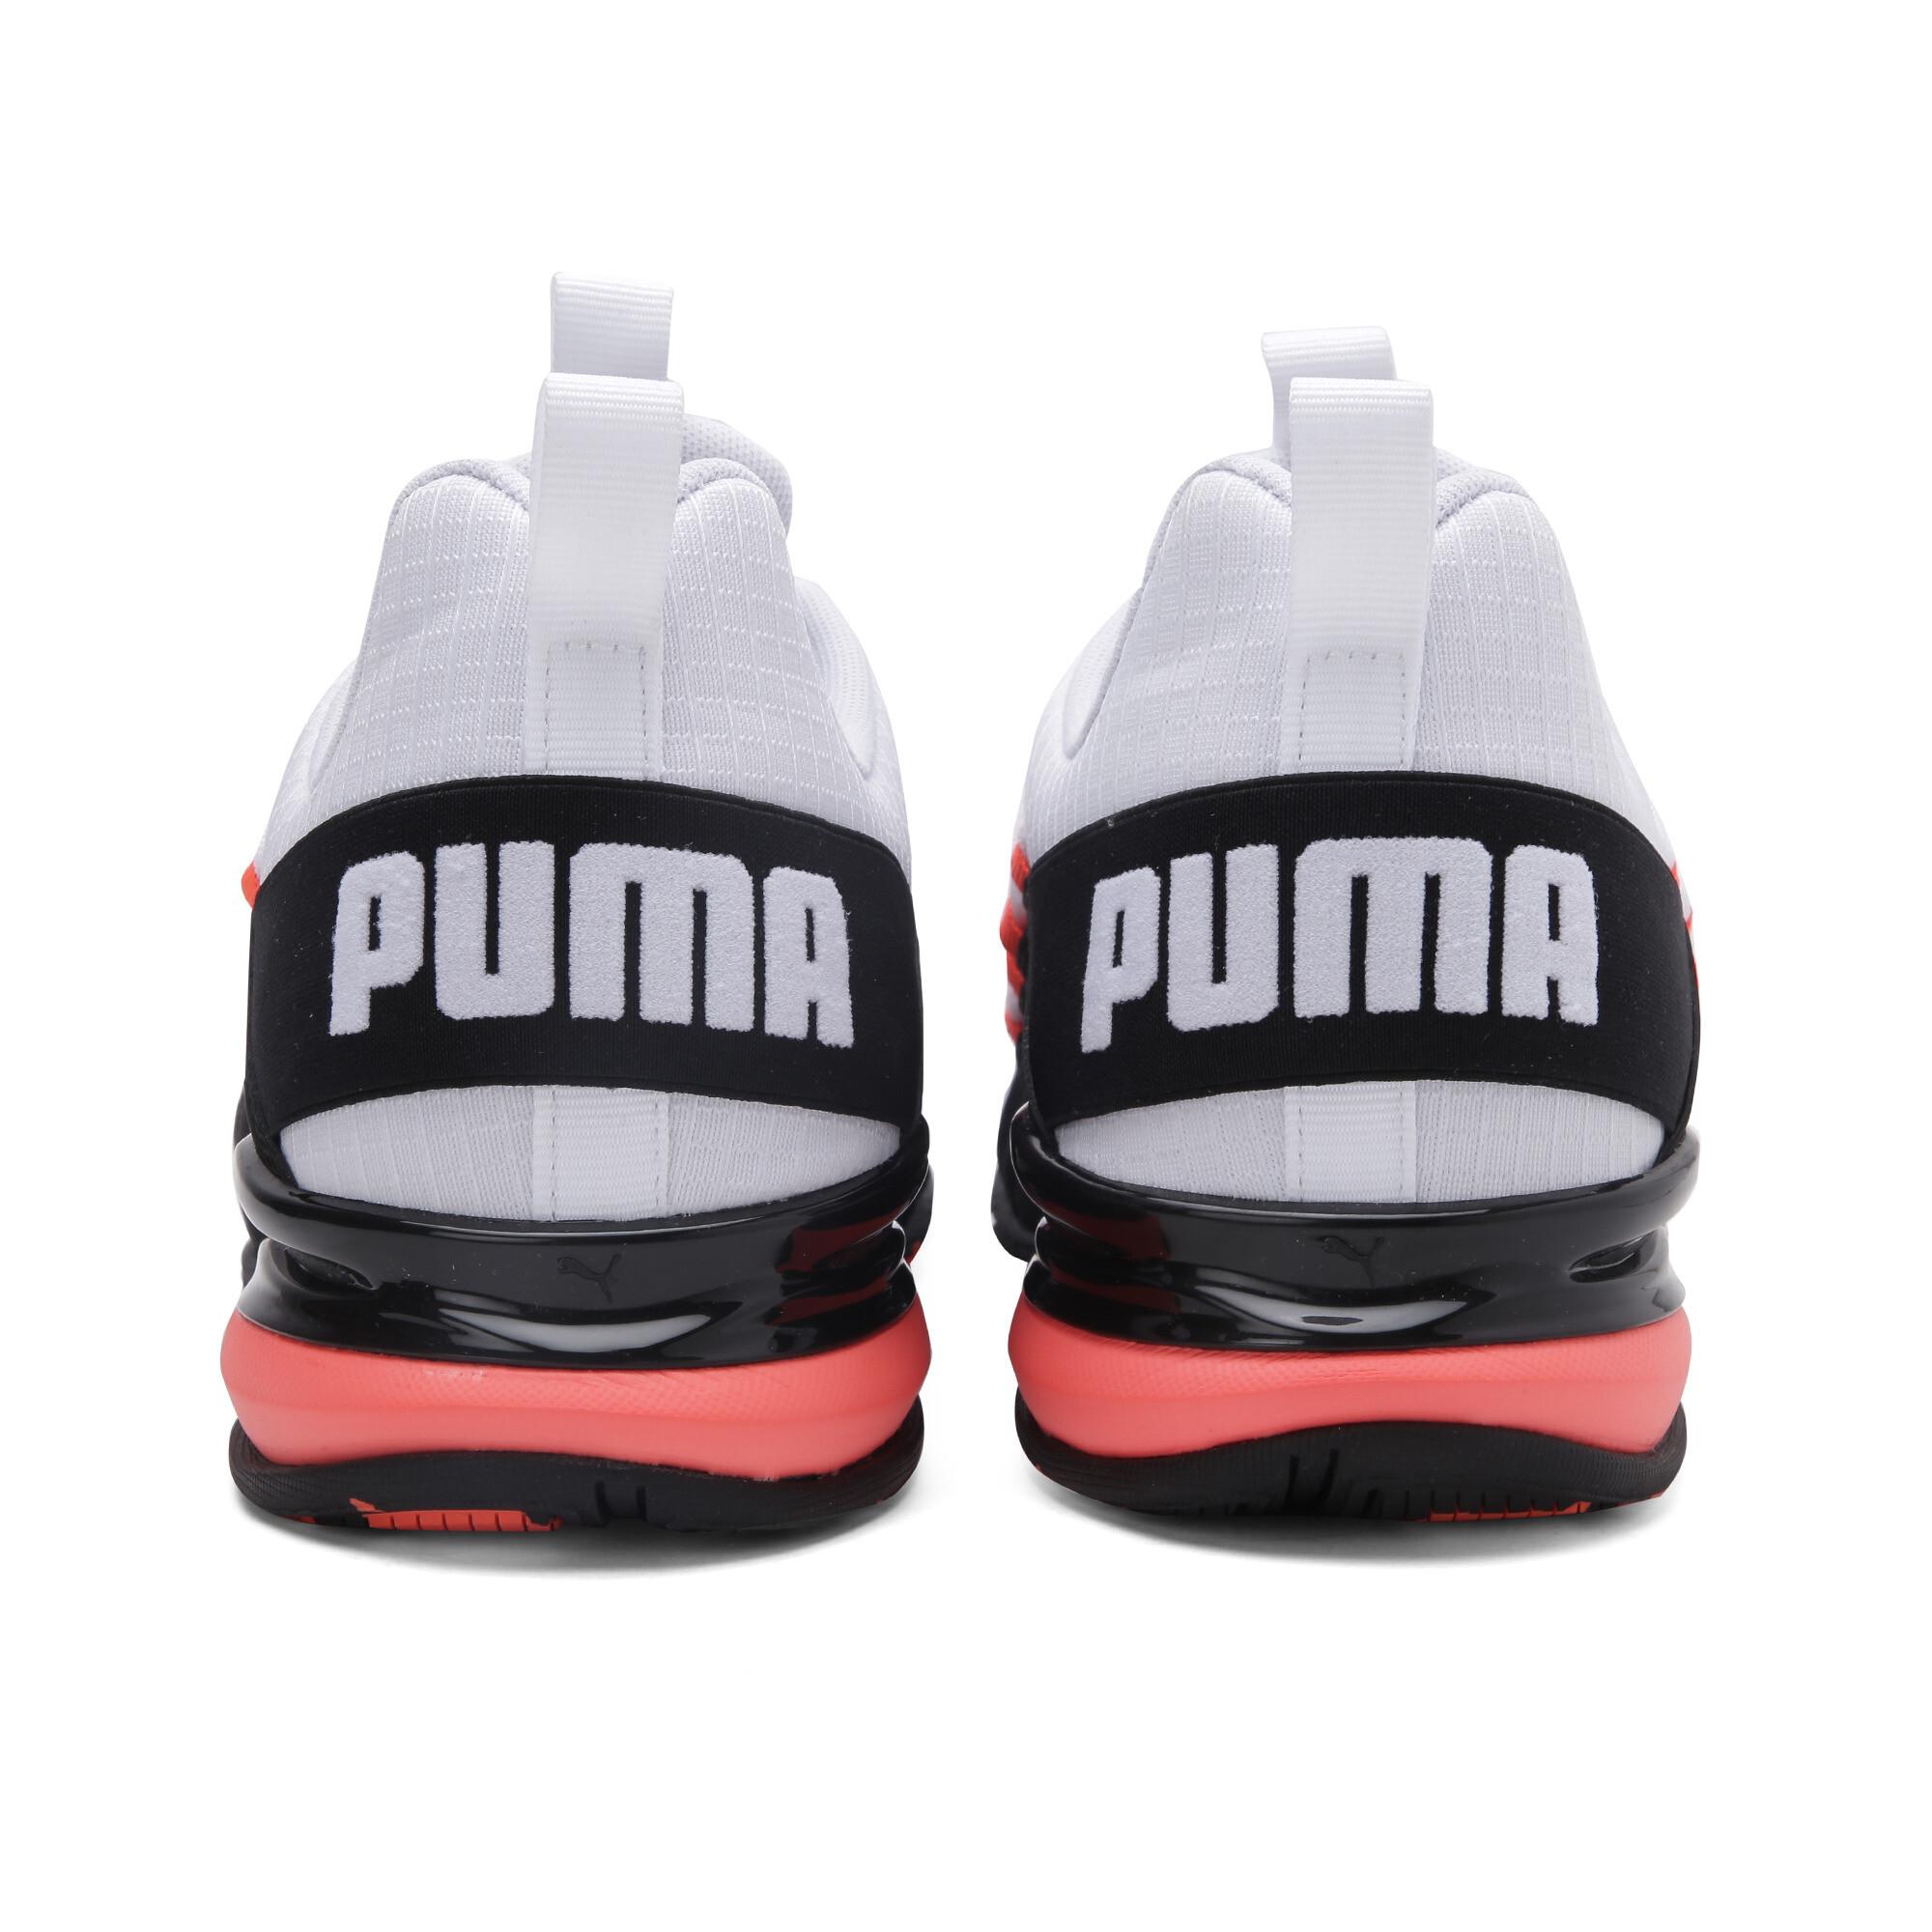 PUMA-Men-039-s-Axelion-Rip-Training-Shoes thumbnail 3